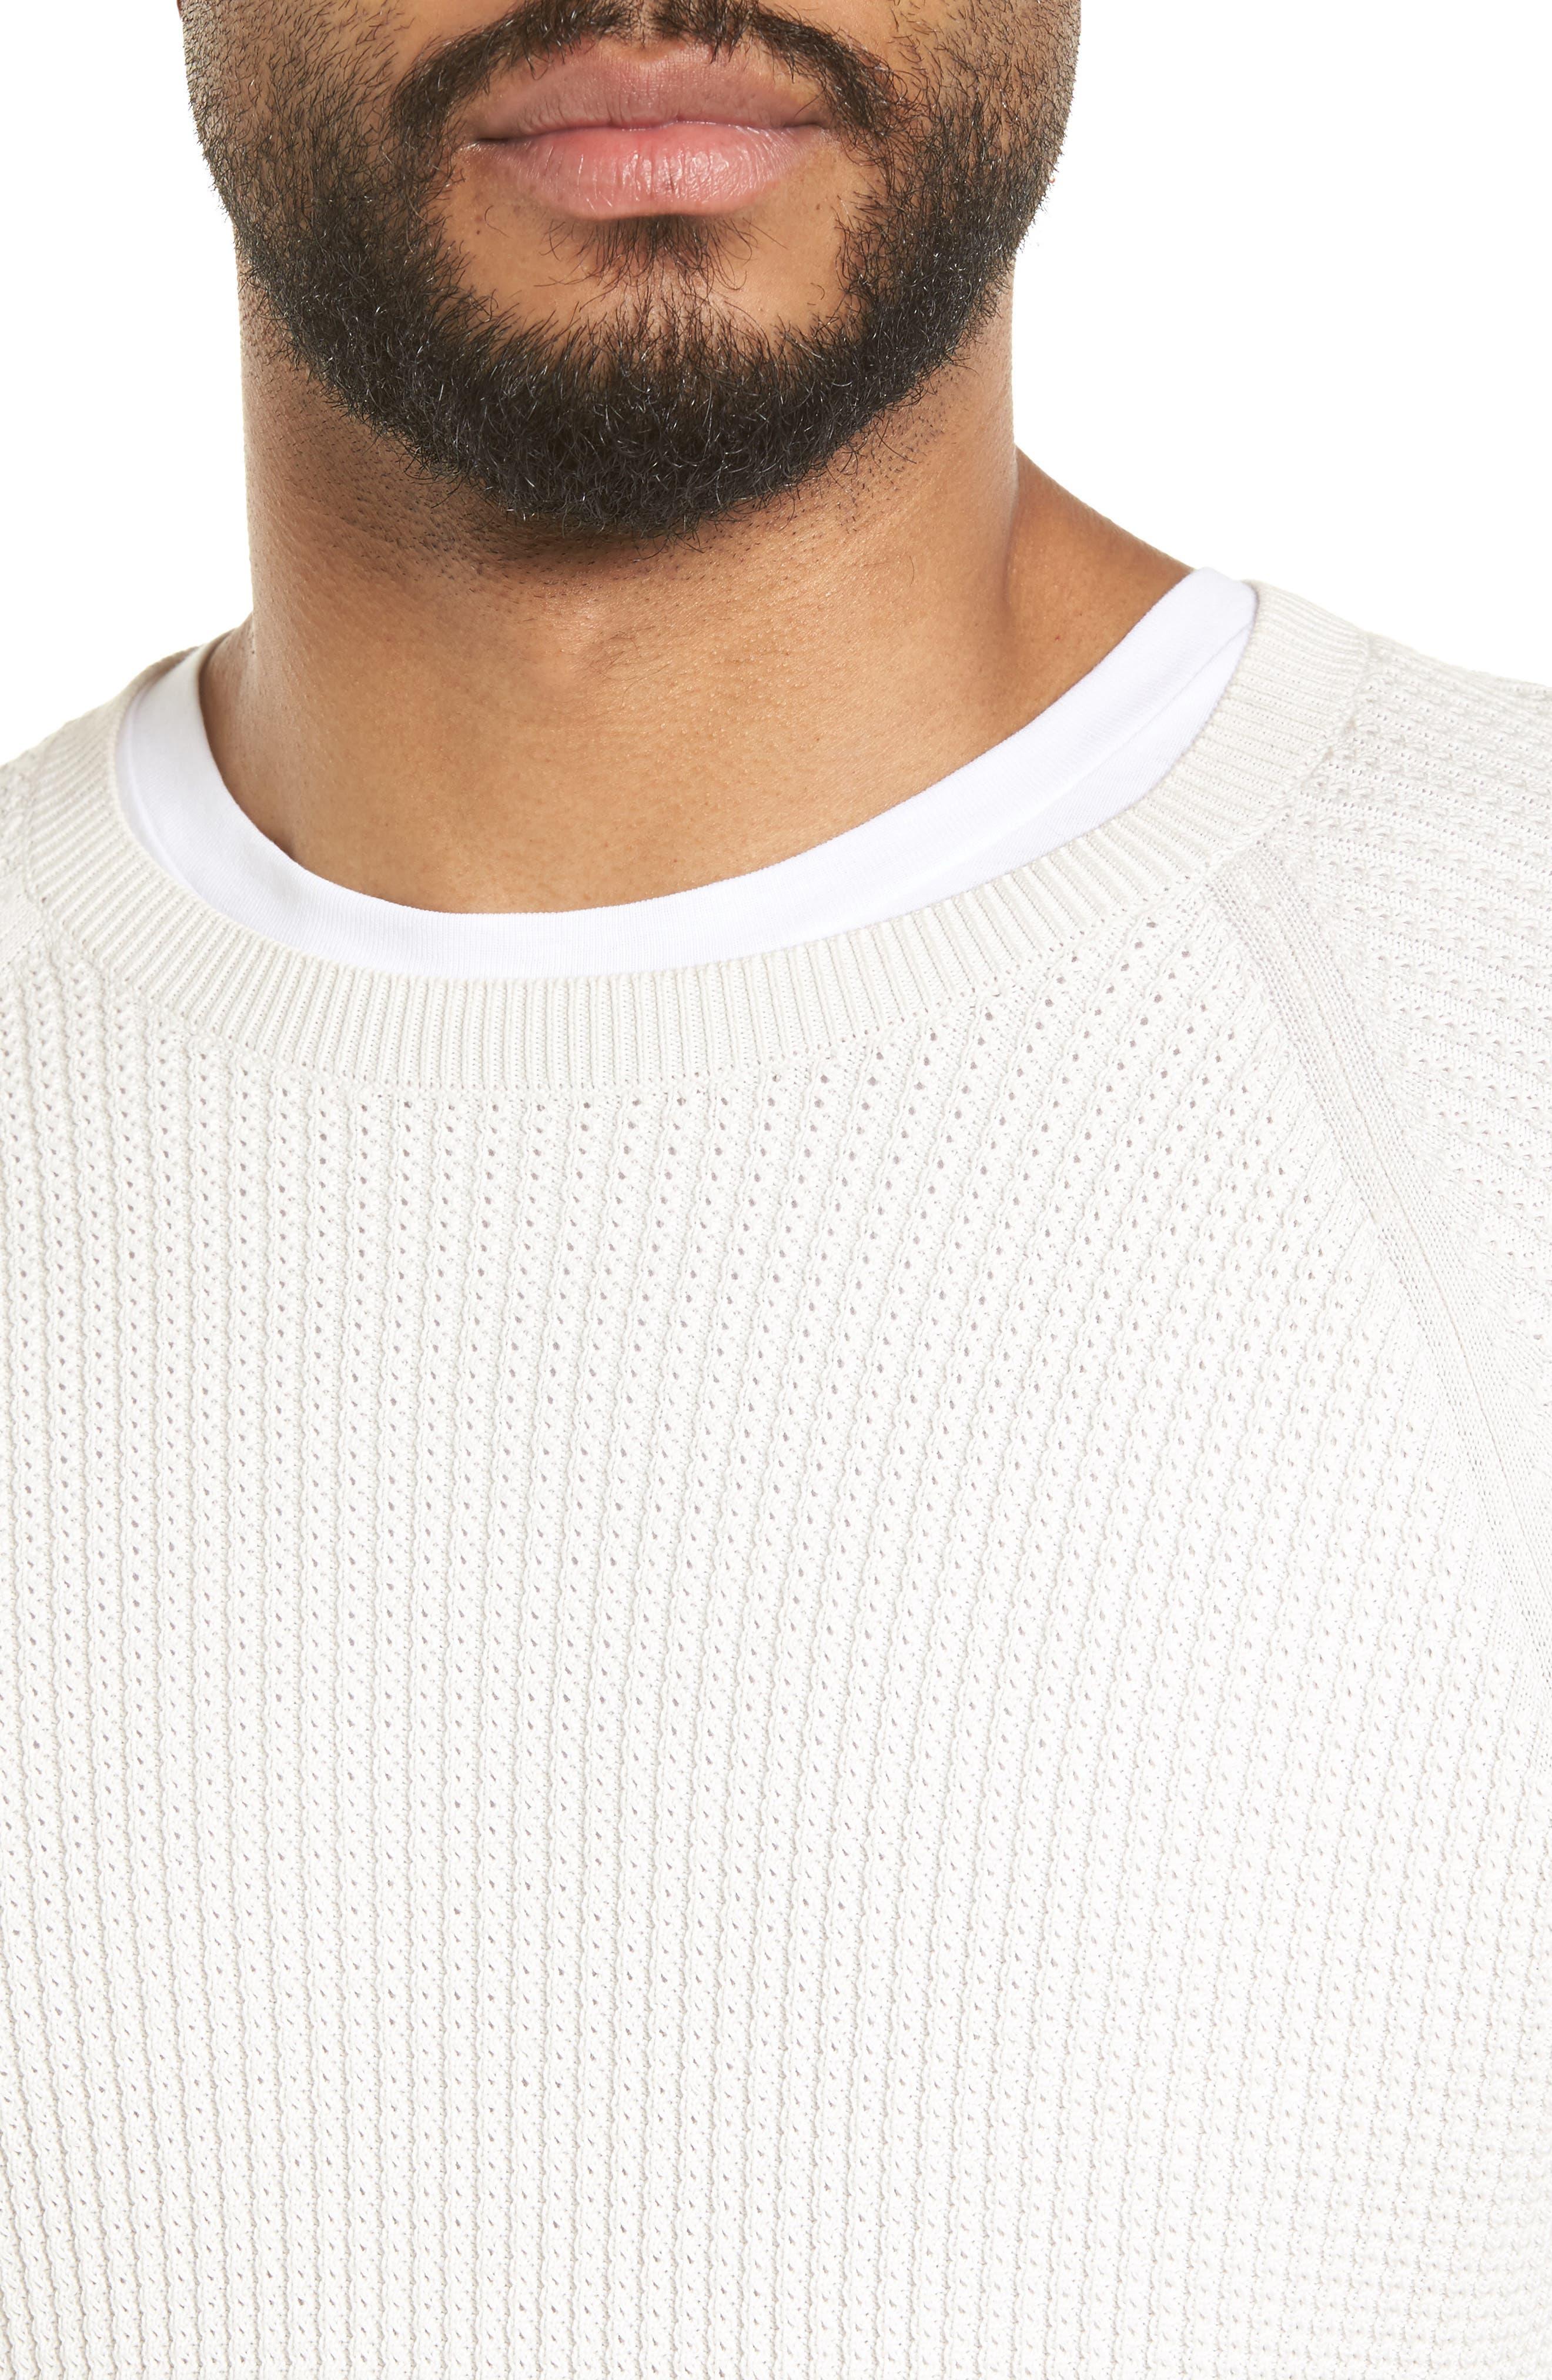 Slim Fit Thermal Knit Raglan Sweater,                             Alternate thumbnail 4, color,                             100